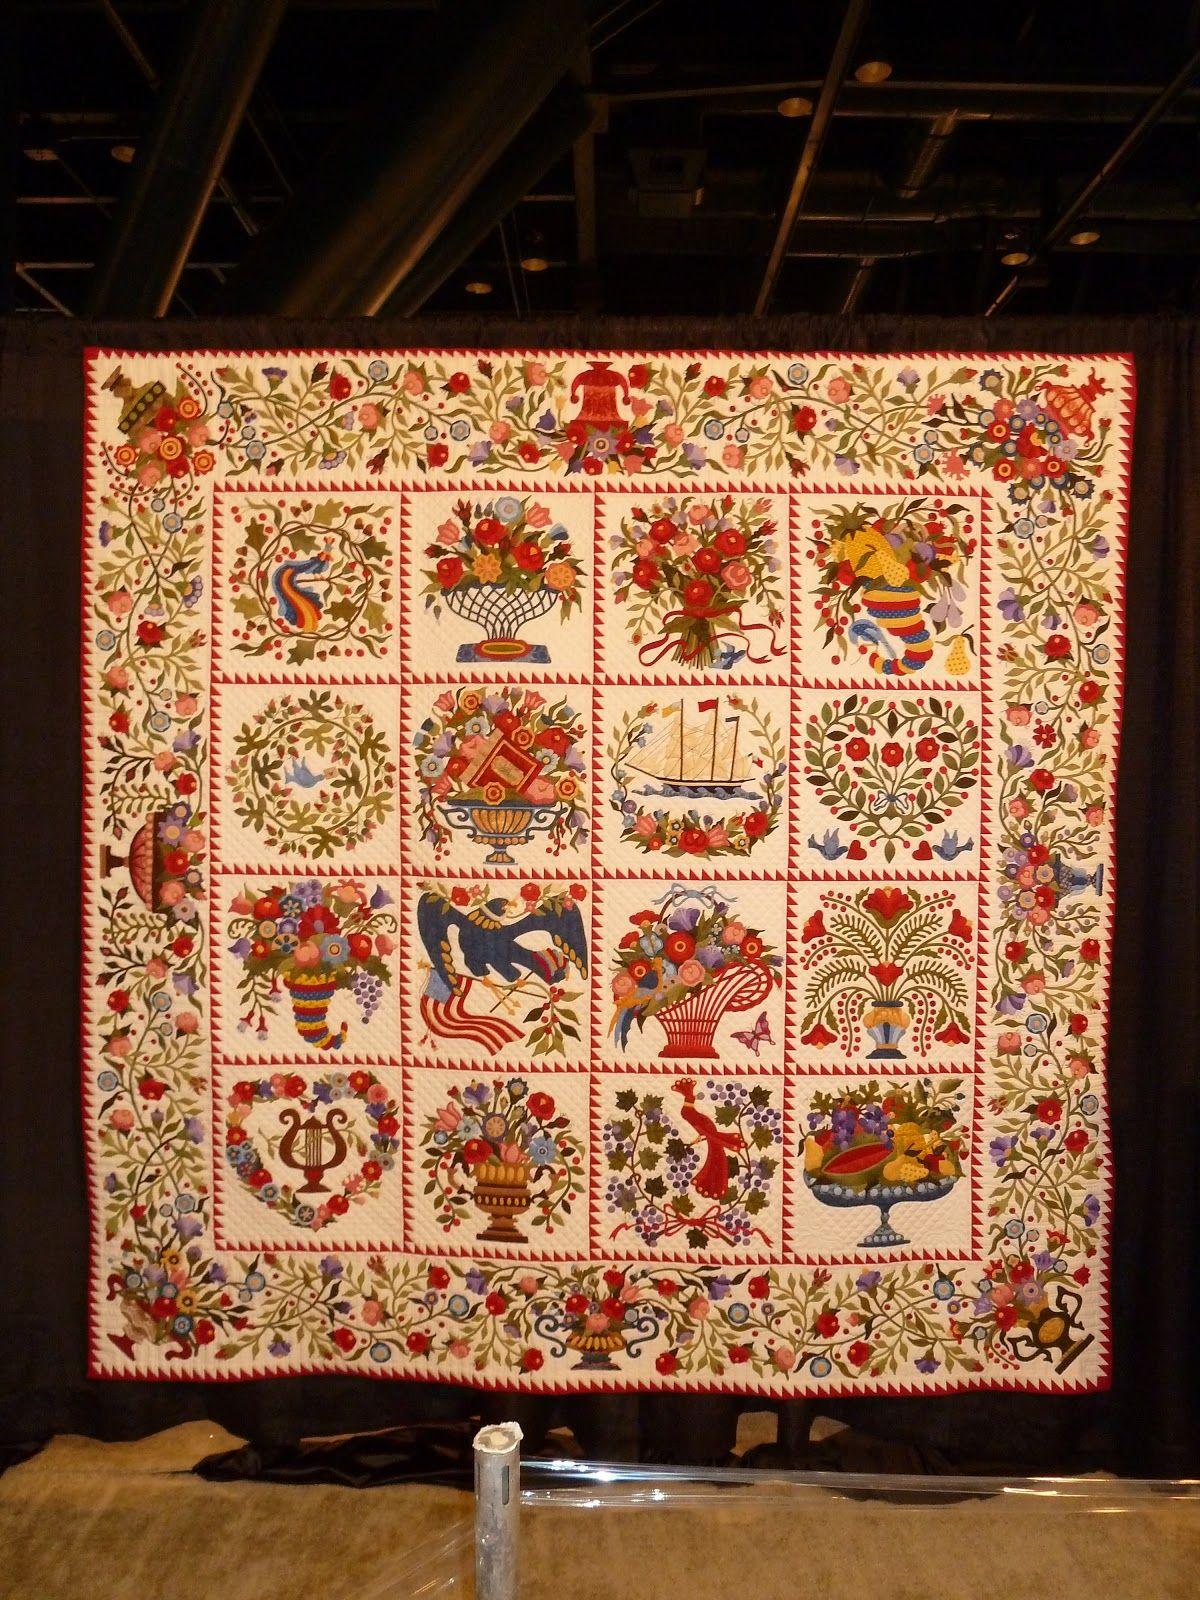 Sue Garman | Quilts | Pinterest : sue garman quilt patterns - Adamdwight.com